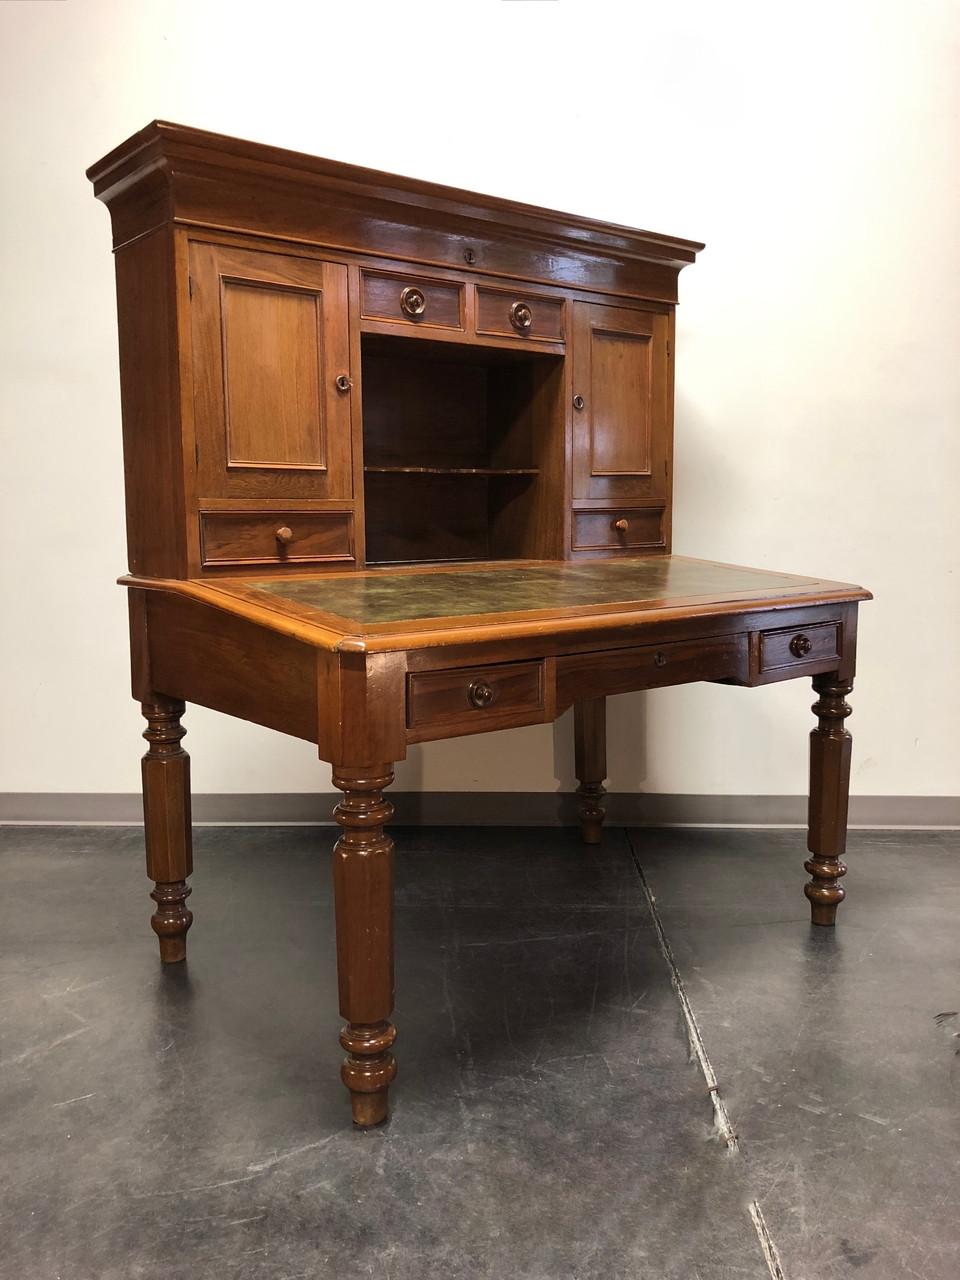 19th Century Antique Walnut Railroad Paymaster Desk - 19th Century Antique Walnut Railroad Paymaster Desk - Boyd's Fine